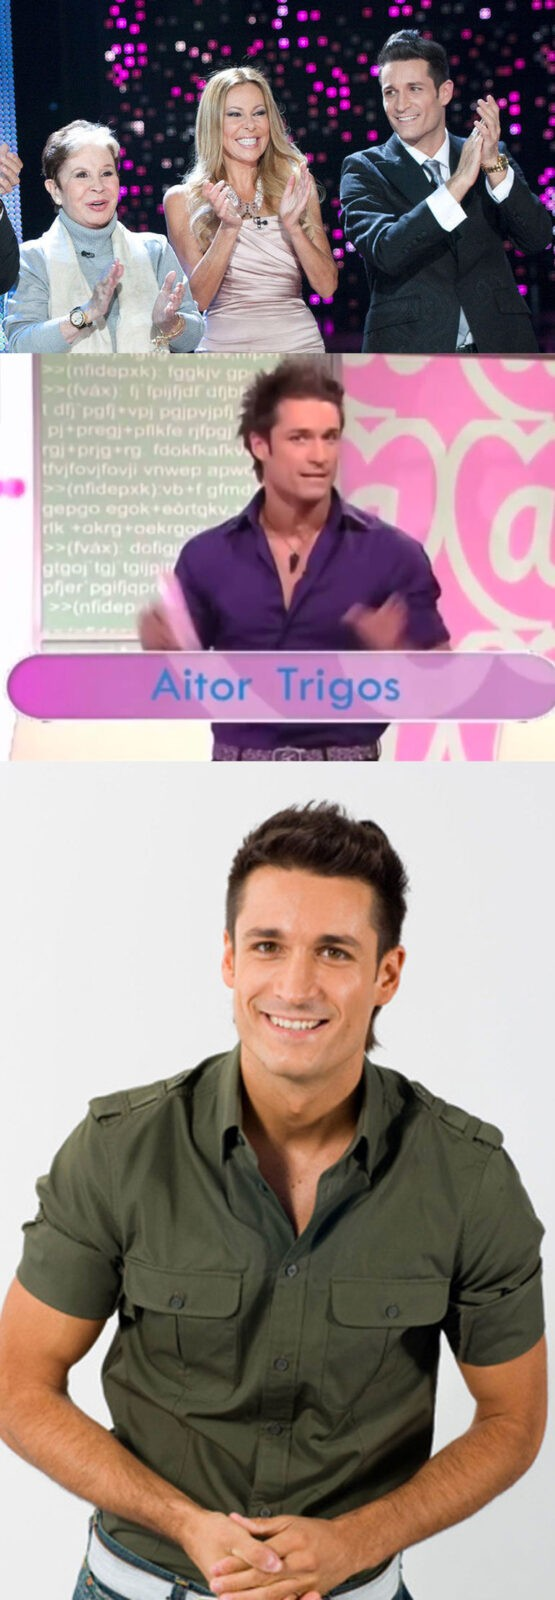 Aitor Trigos